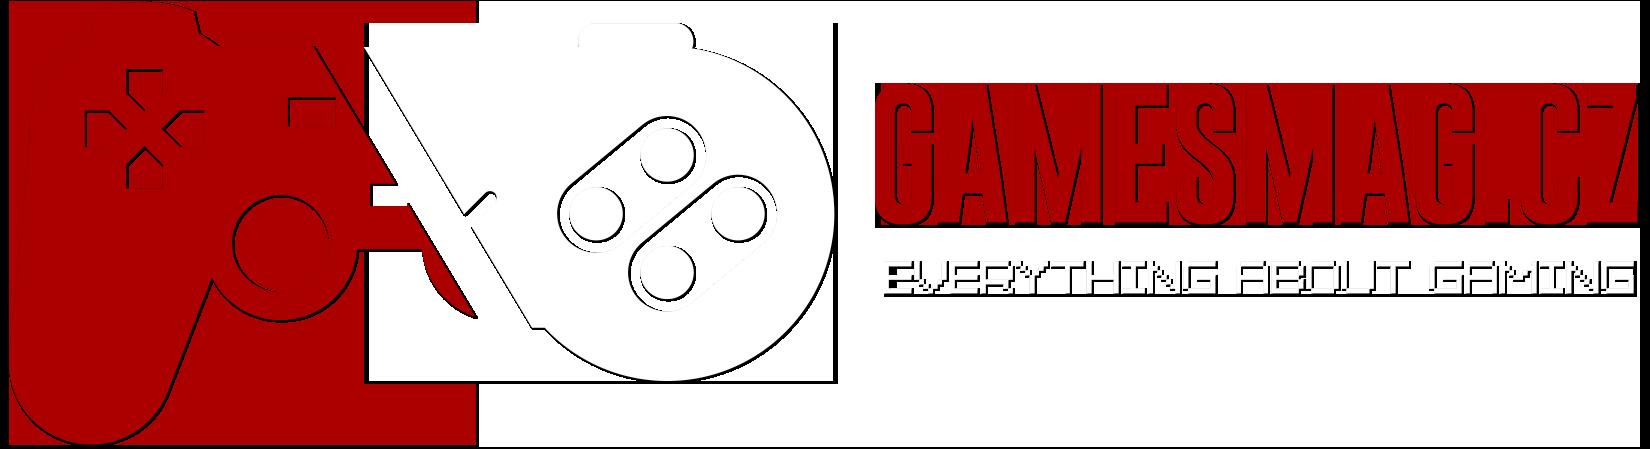 Gamesmag.cz